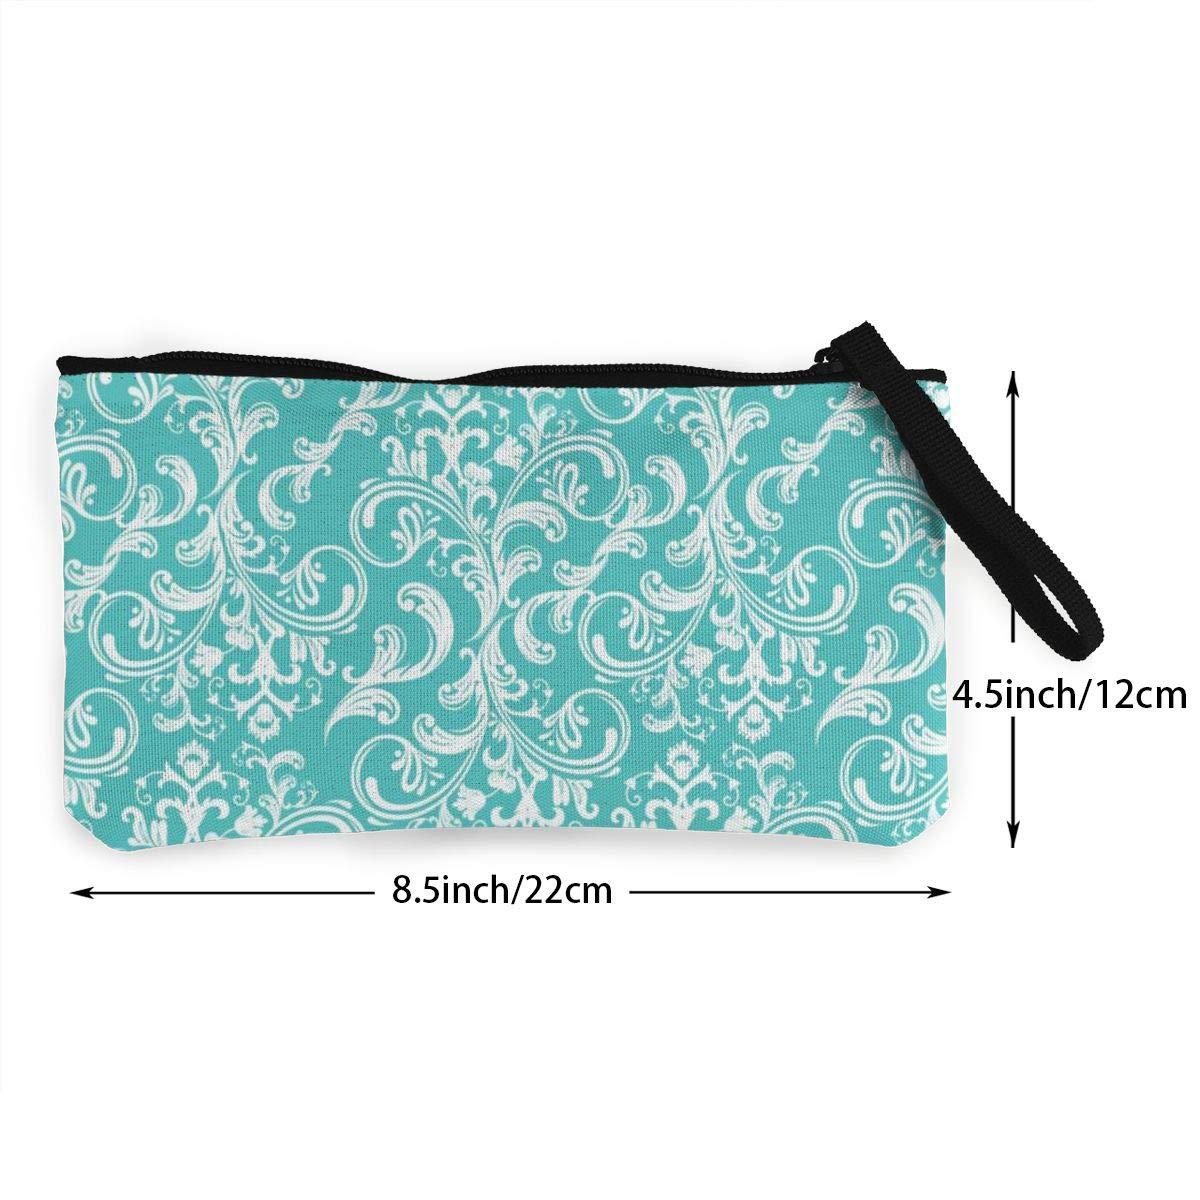 Coin Pouch Pretty Arabesque Blue Canvas Coin Purse Cellphone Card Bag With Handle And Zipper